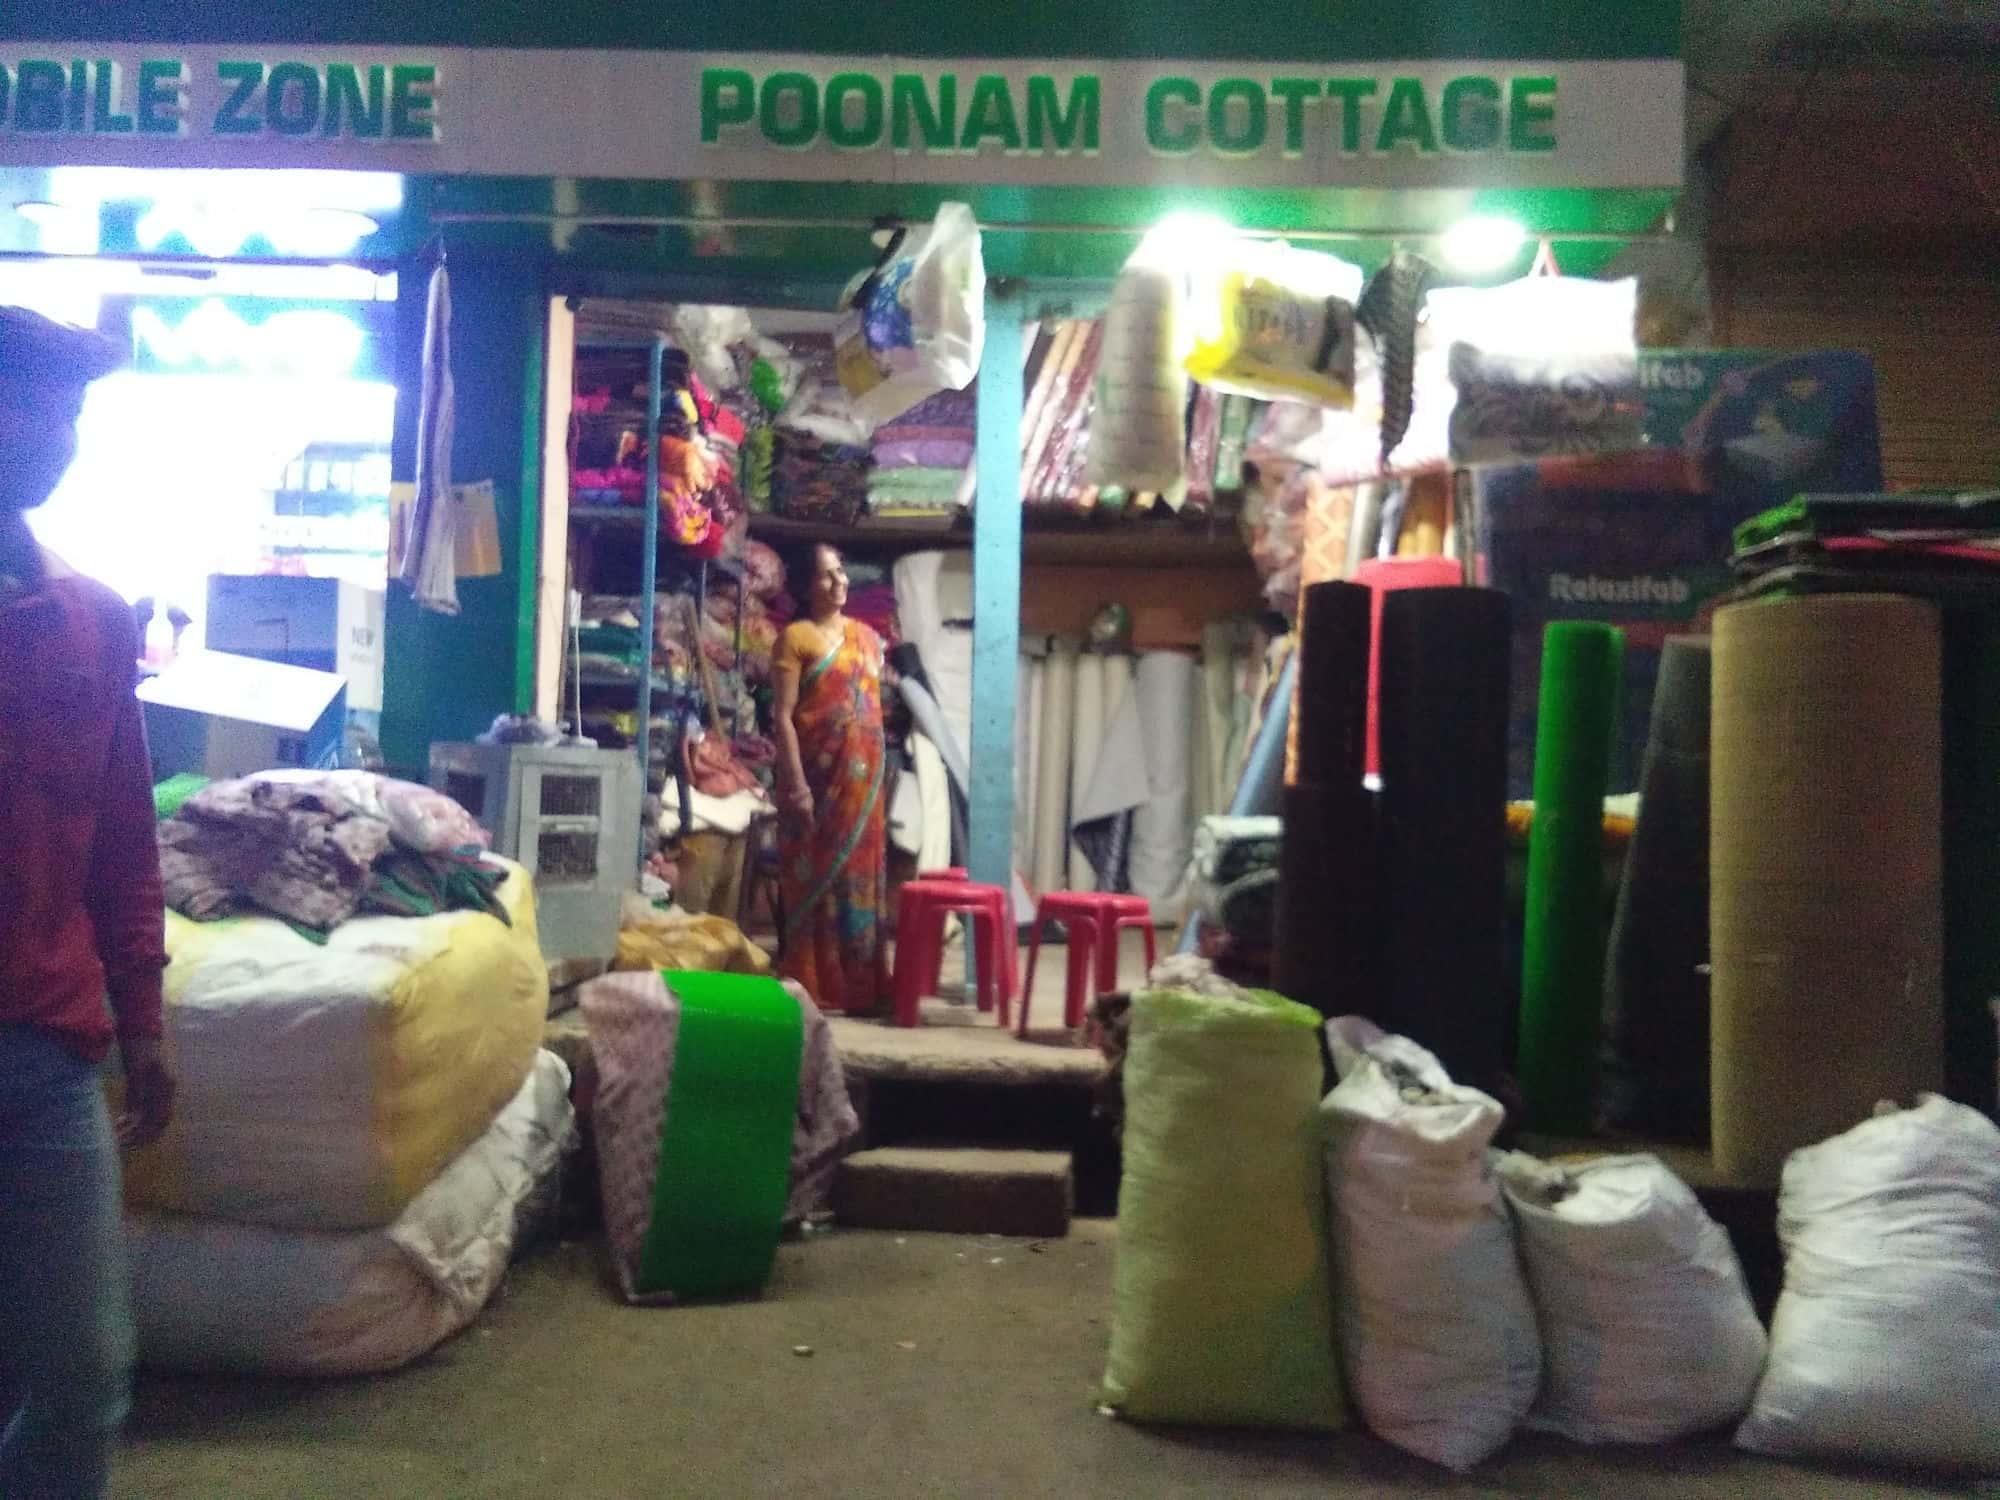 Poonam Cottage & Rajai Gadda House, Guna HO - Mattress